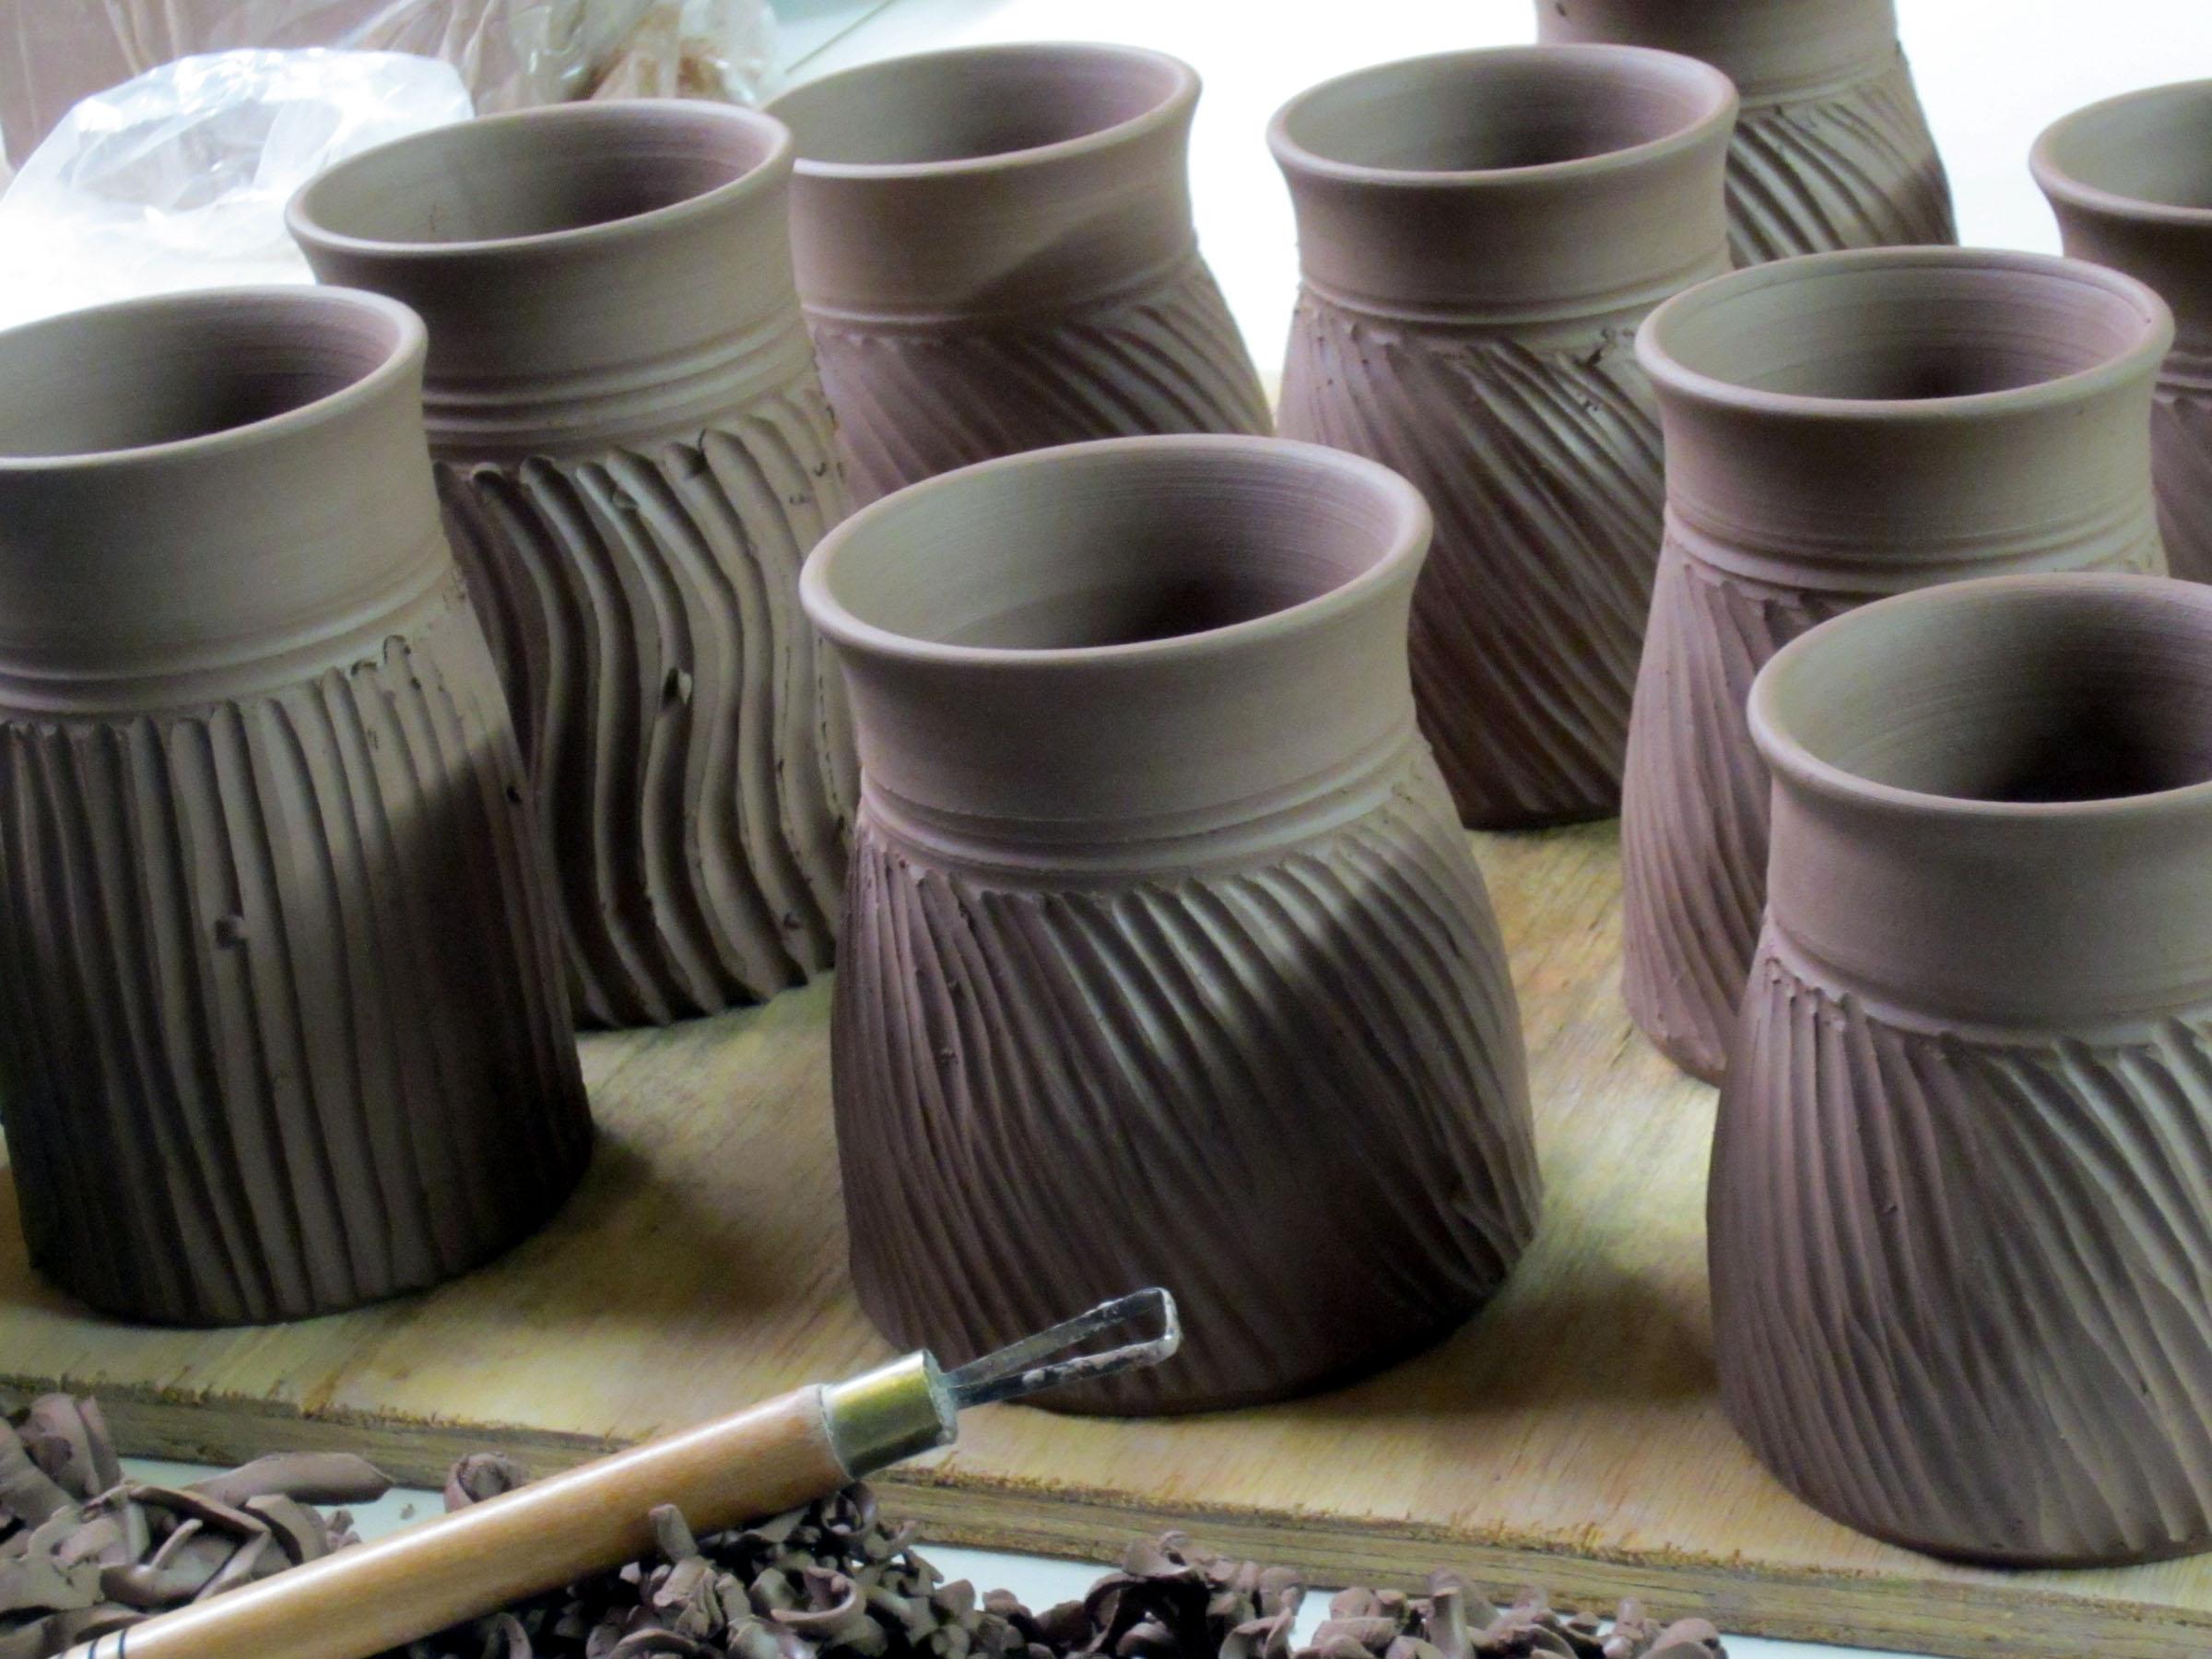 carved mugs.jpg